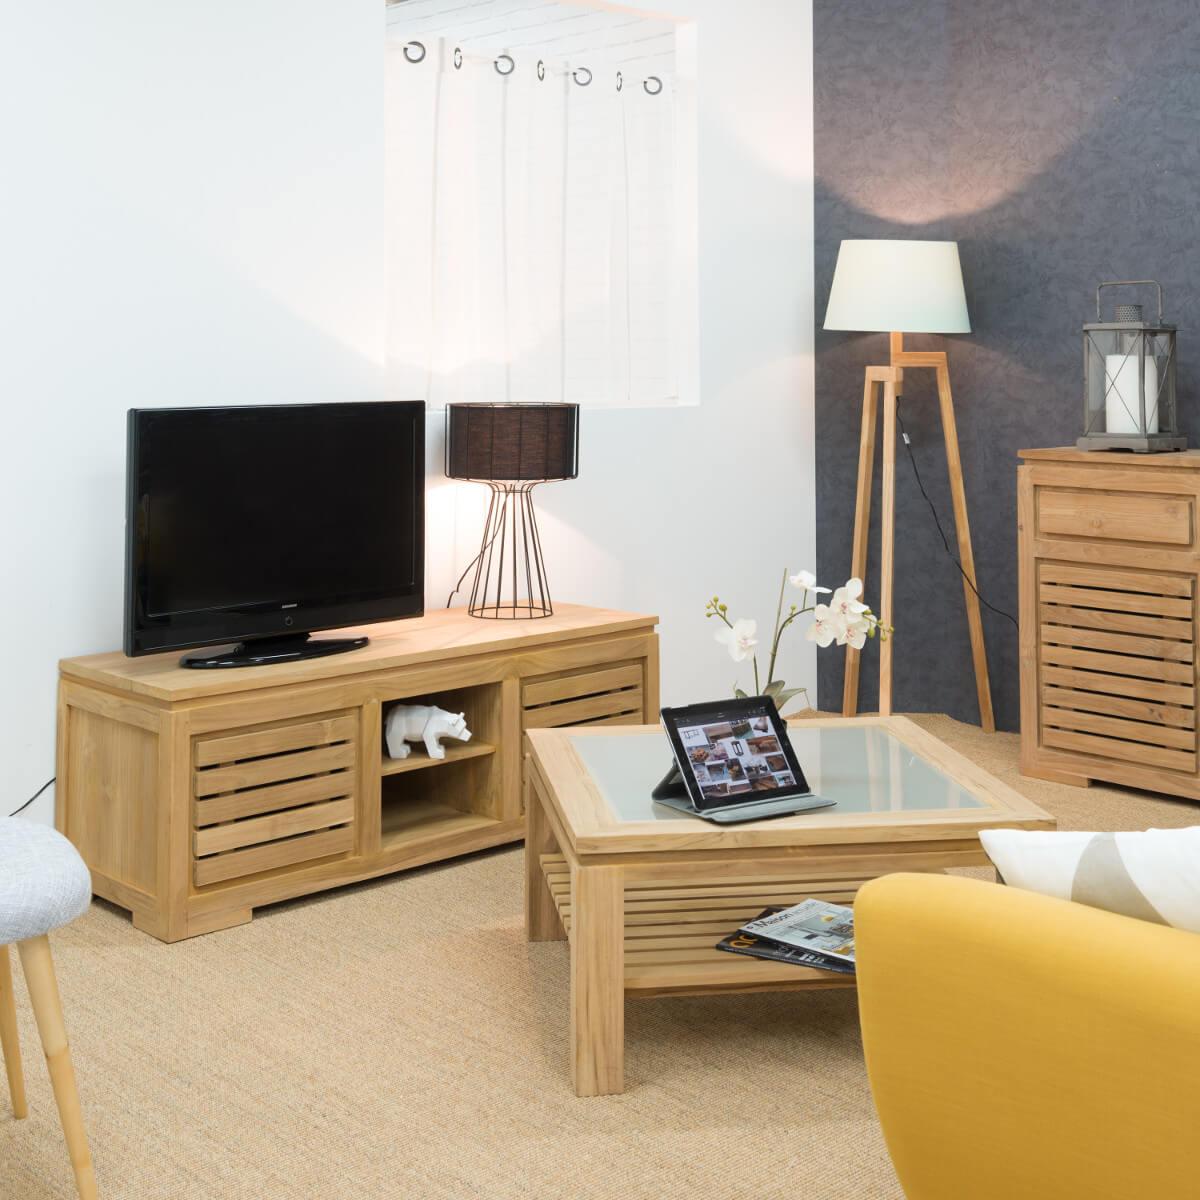 buffet de salon en bois de teck massif zen rectangle naturel l 160 cm. Black Bedroom Furniture Sets. Home Design Ideas